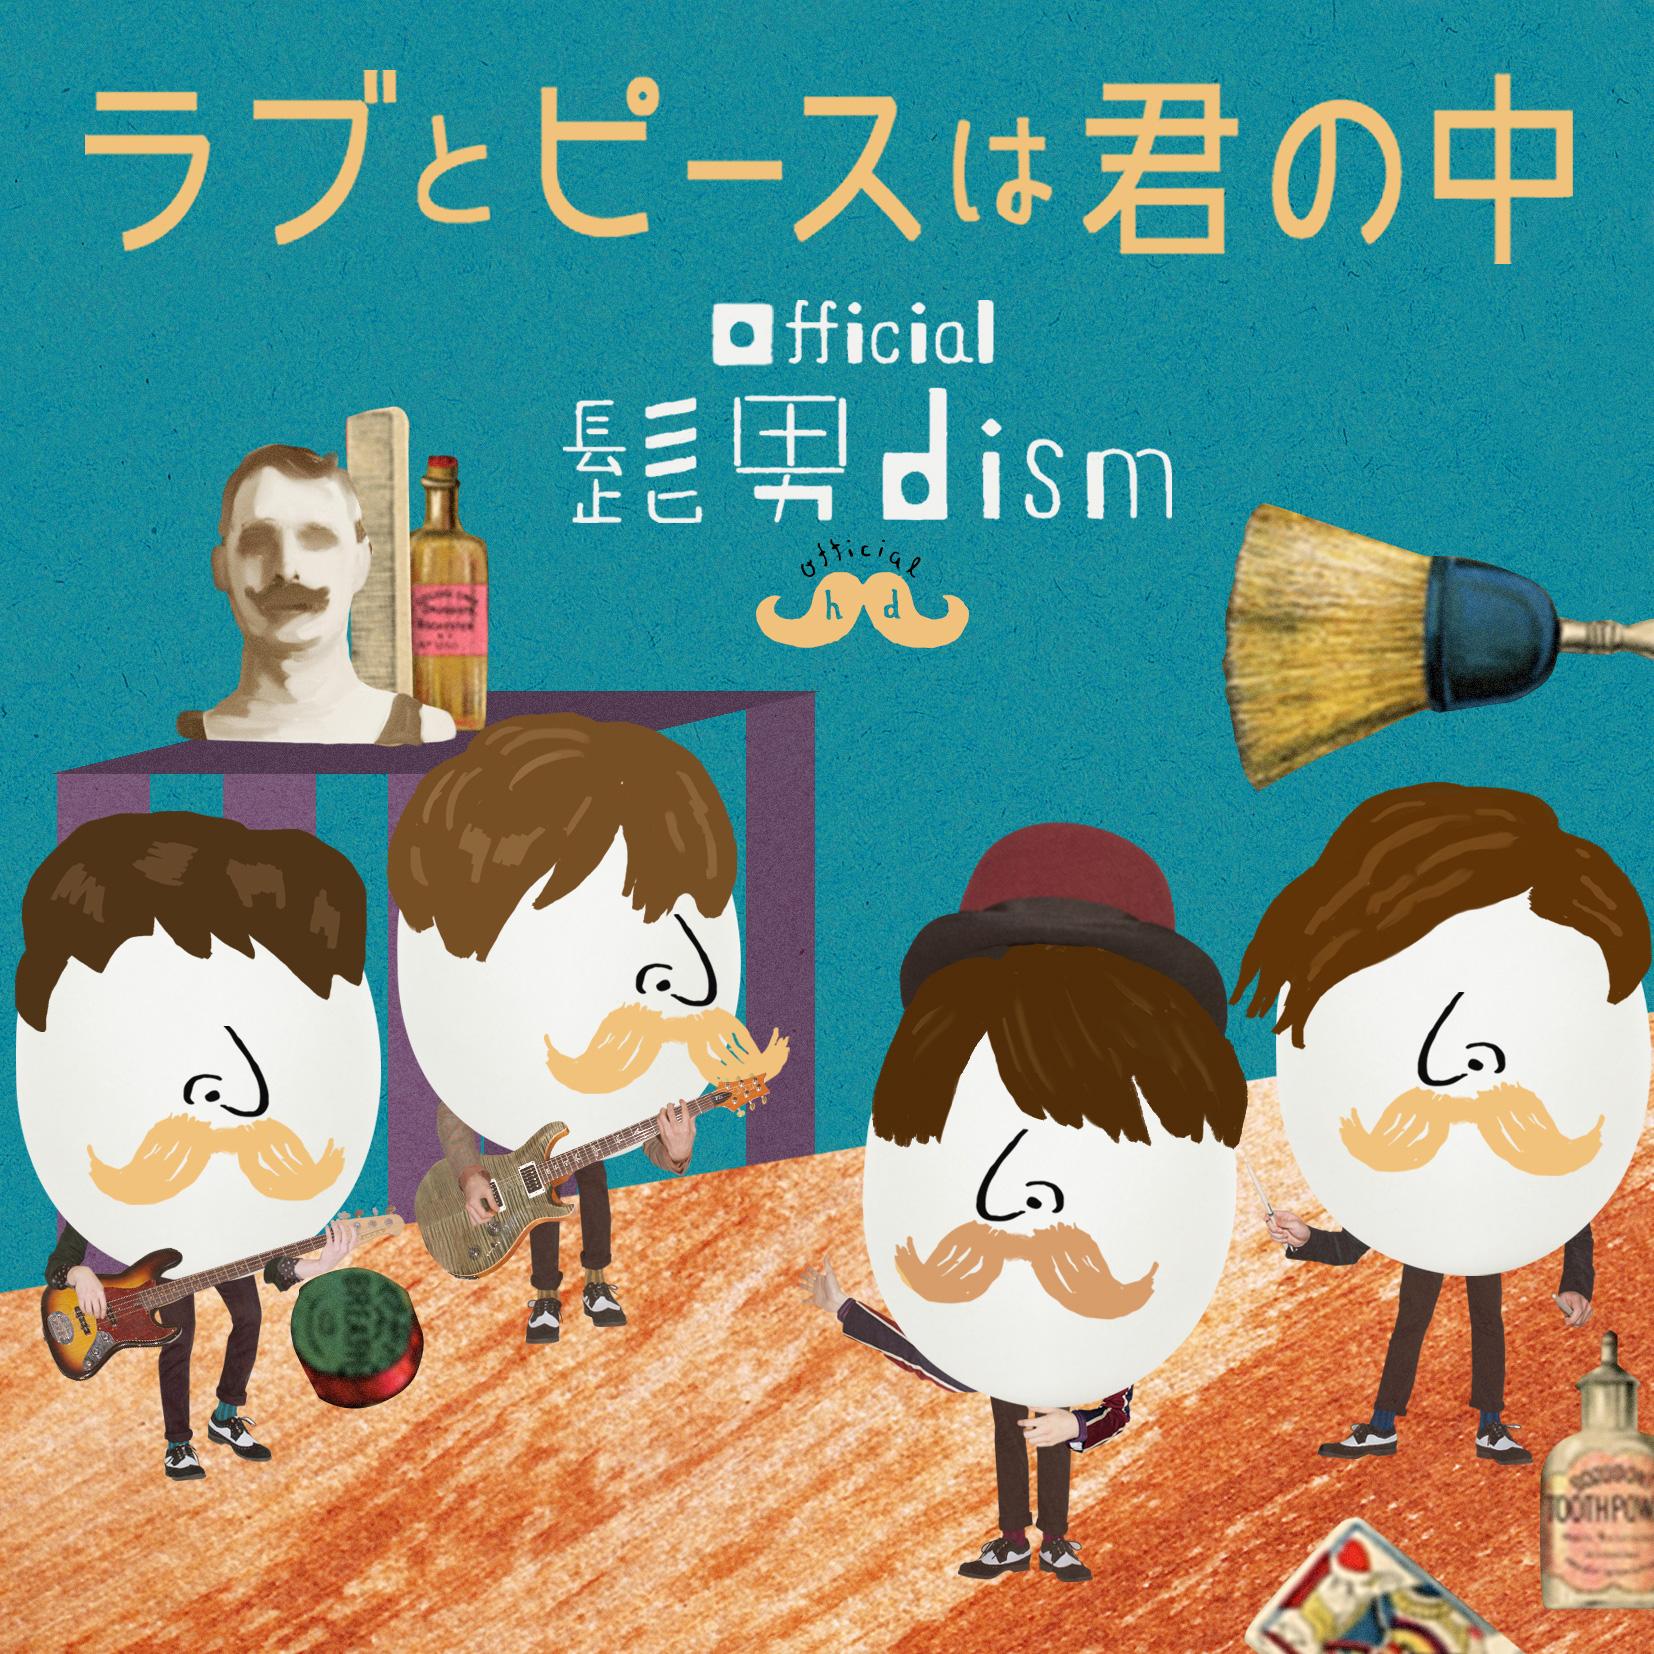 Official 髭男 dism_ラブとピースは君の中